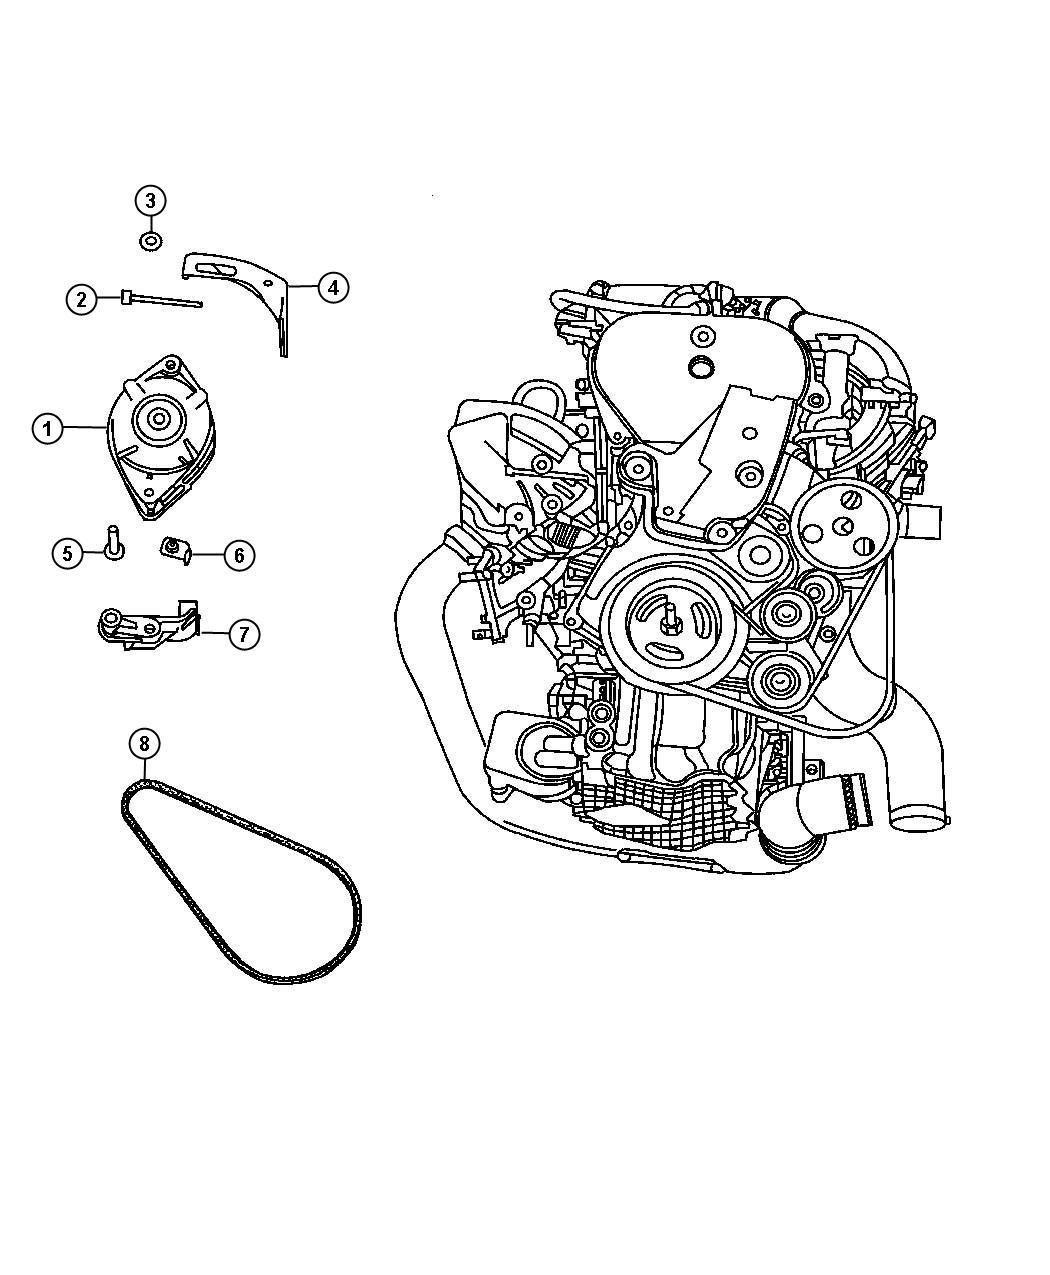 Alternator 2 4l Edt Dohc Turbo